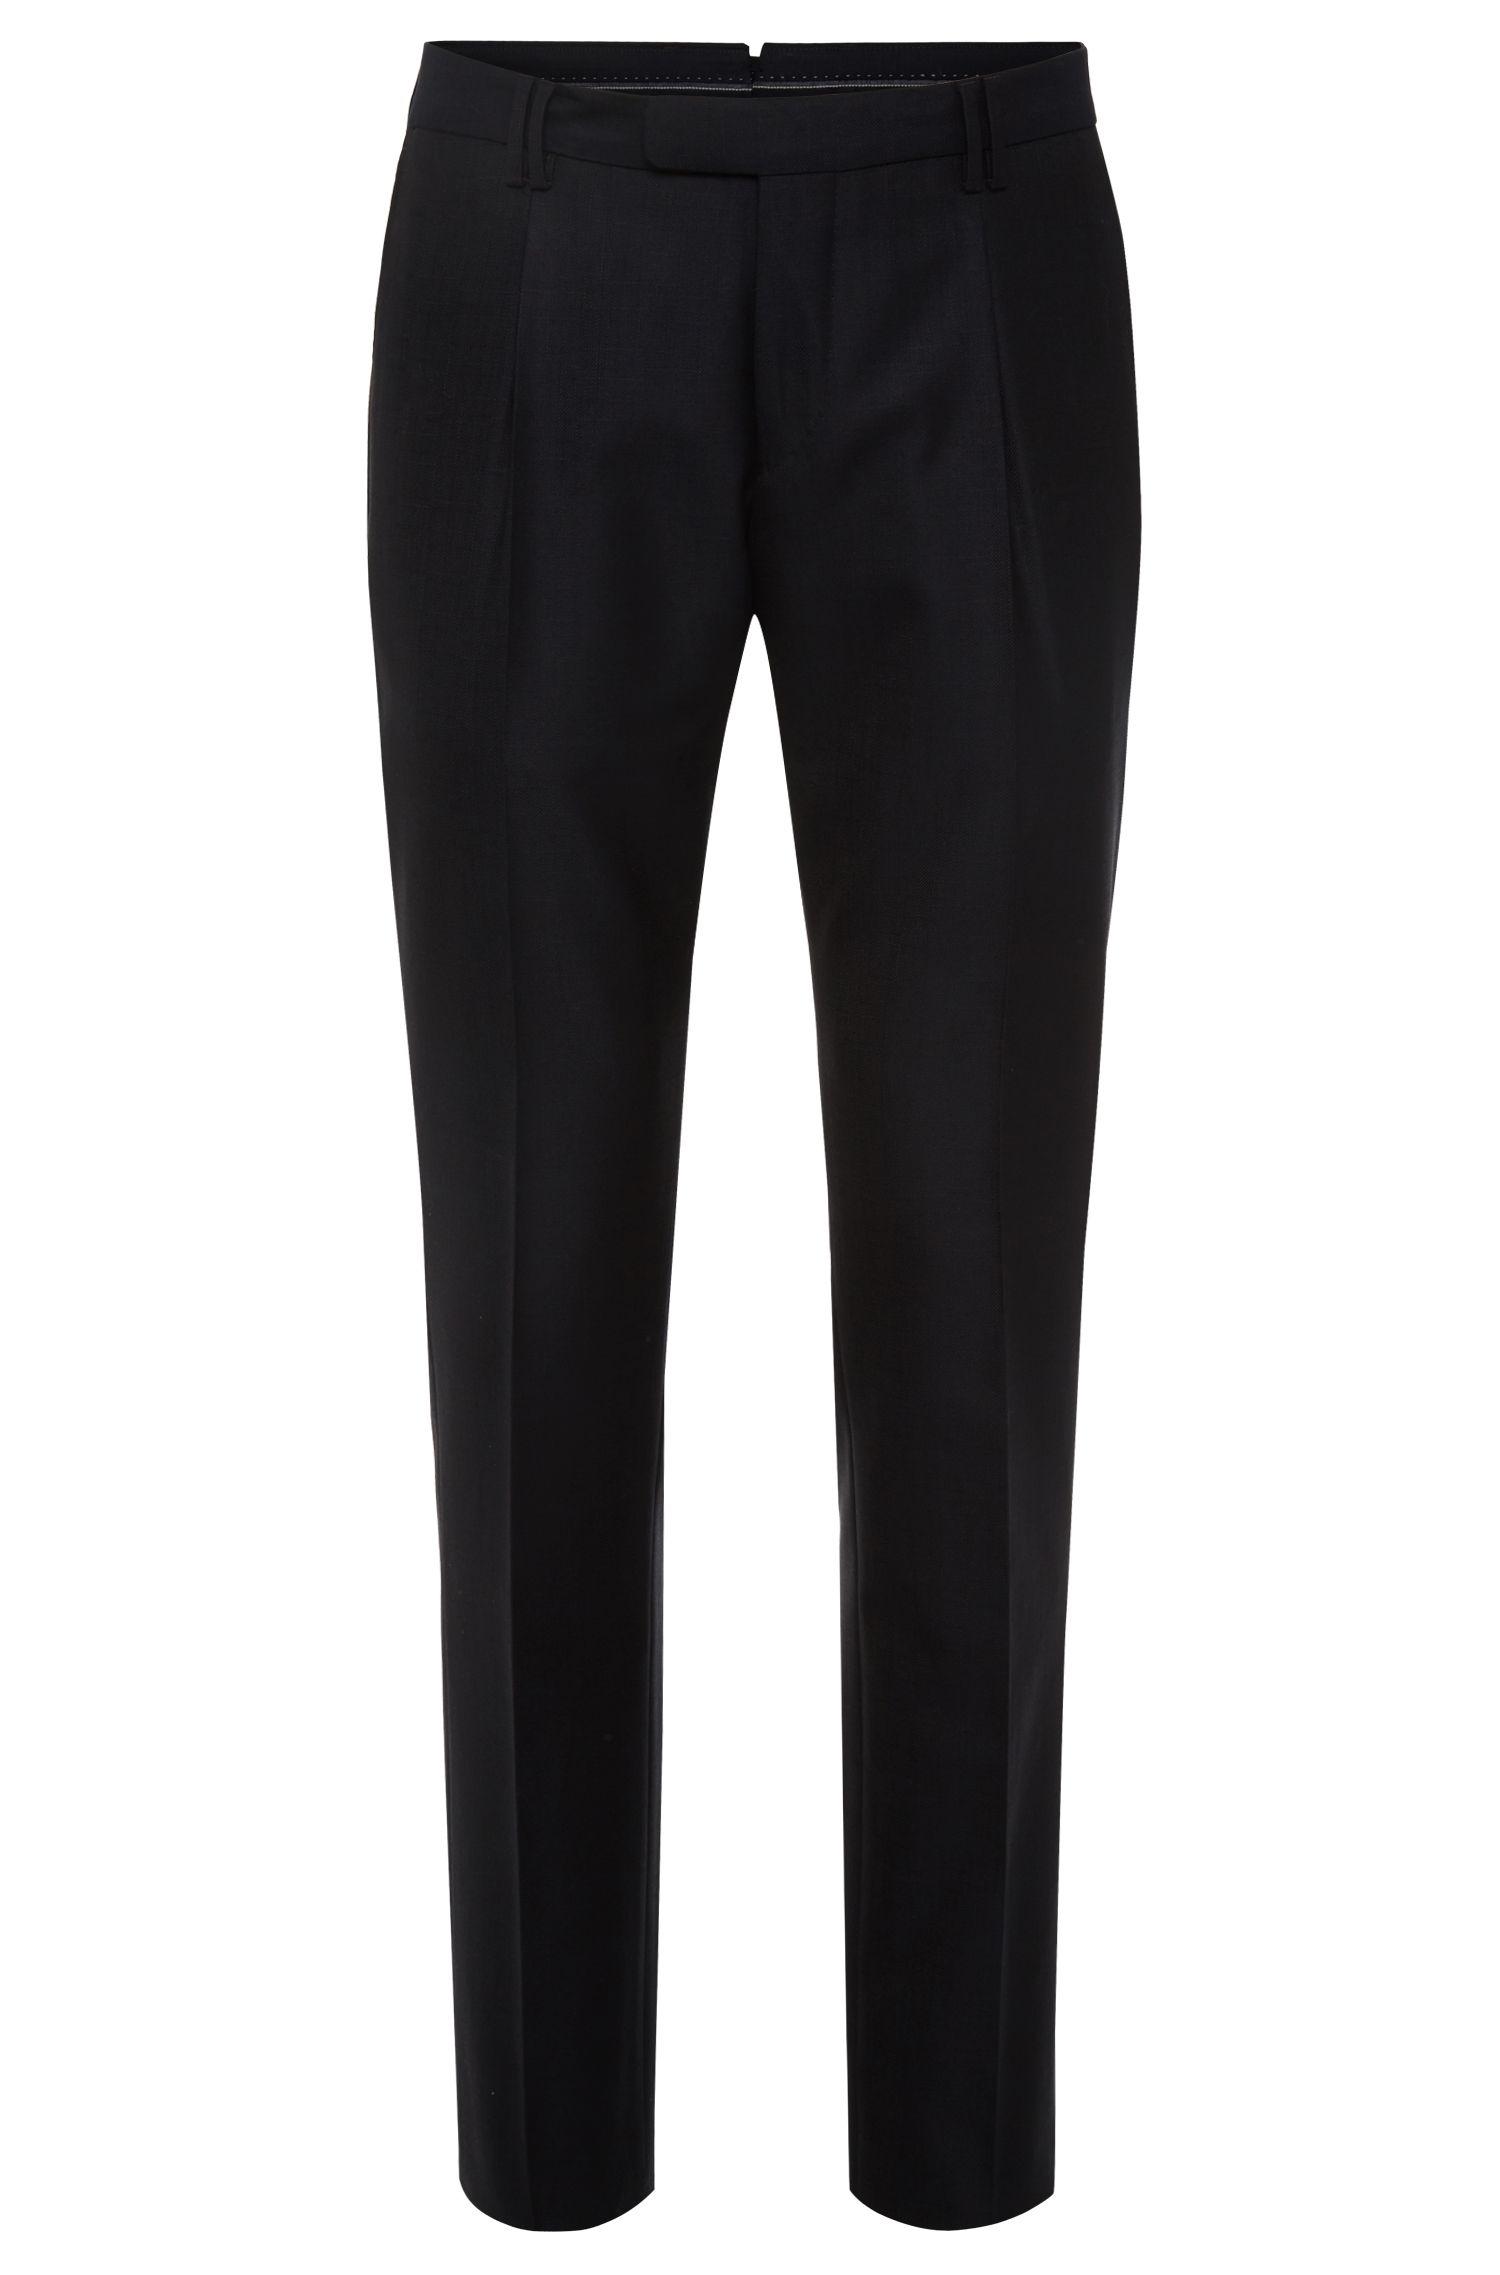 'T-Grovy' | Slim Fit, Italian Cotton Virgin Wool Dress Pants